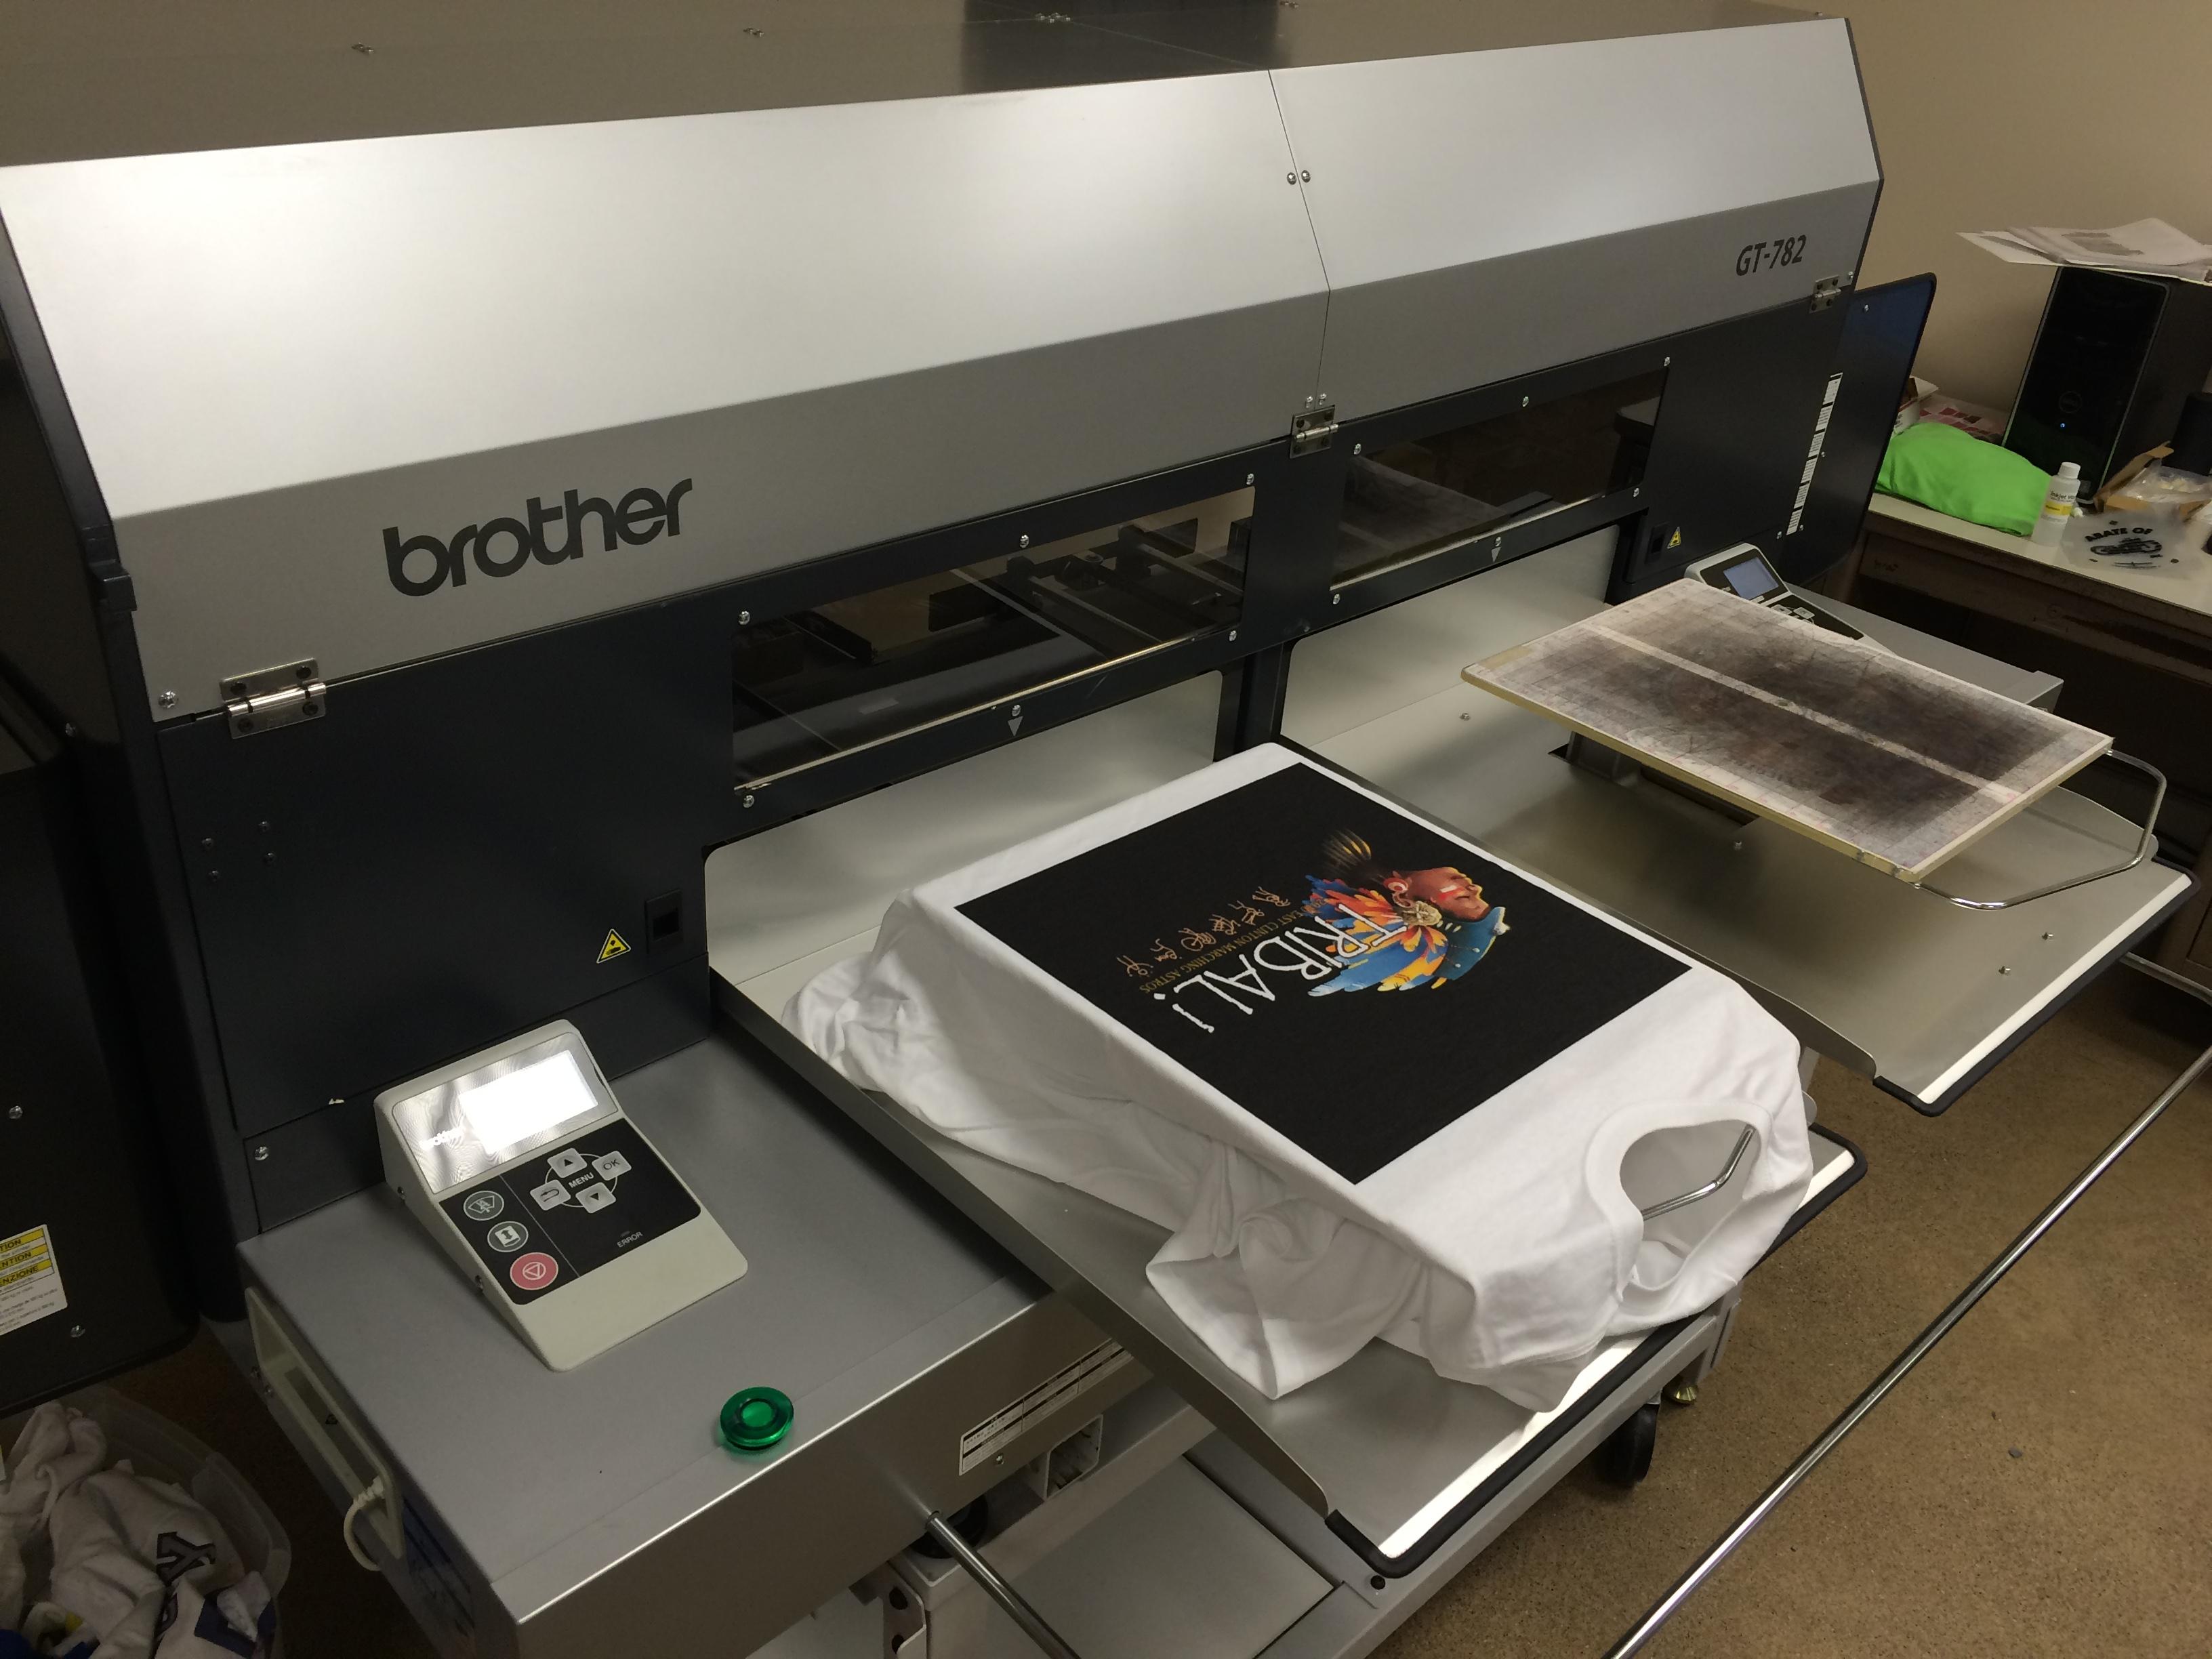 Brother gt 782 digital garment printer package for sale for T shirt digital printer